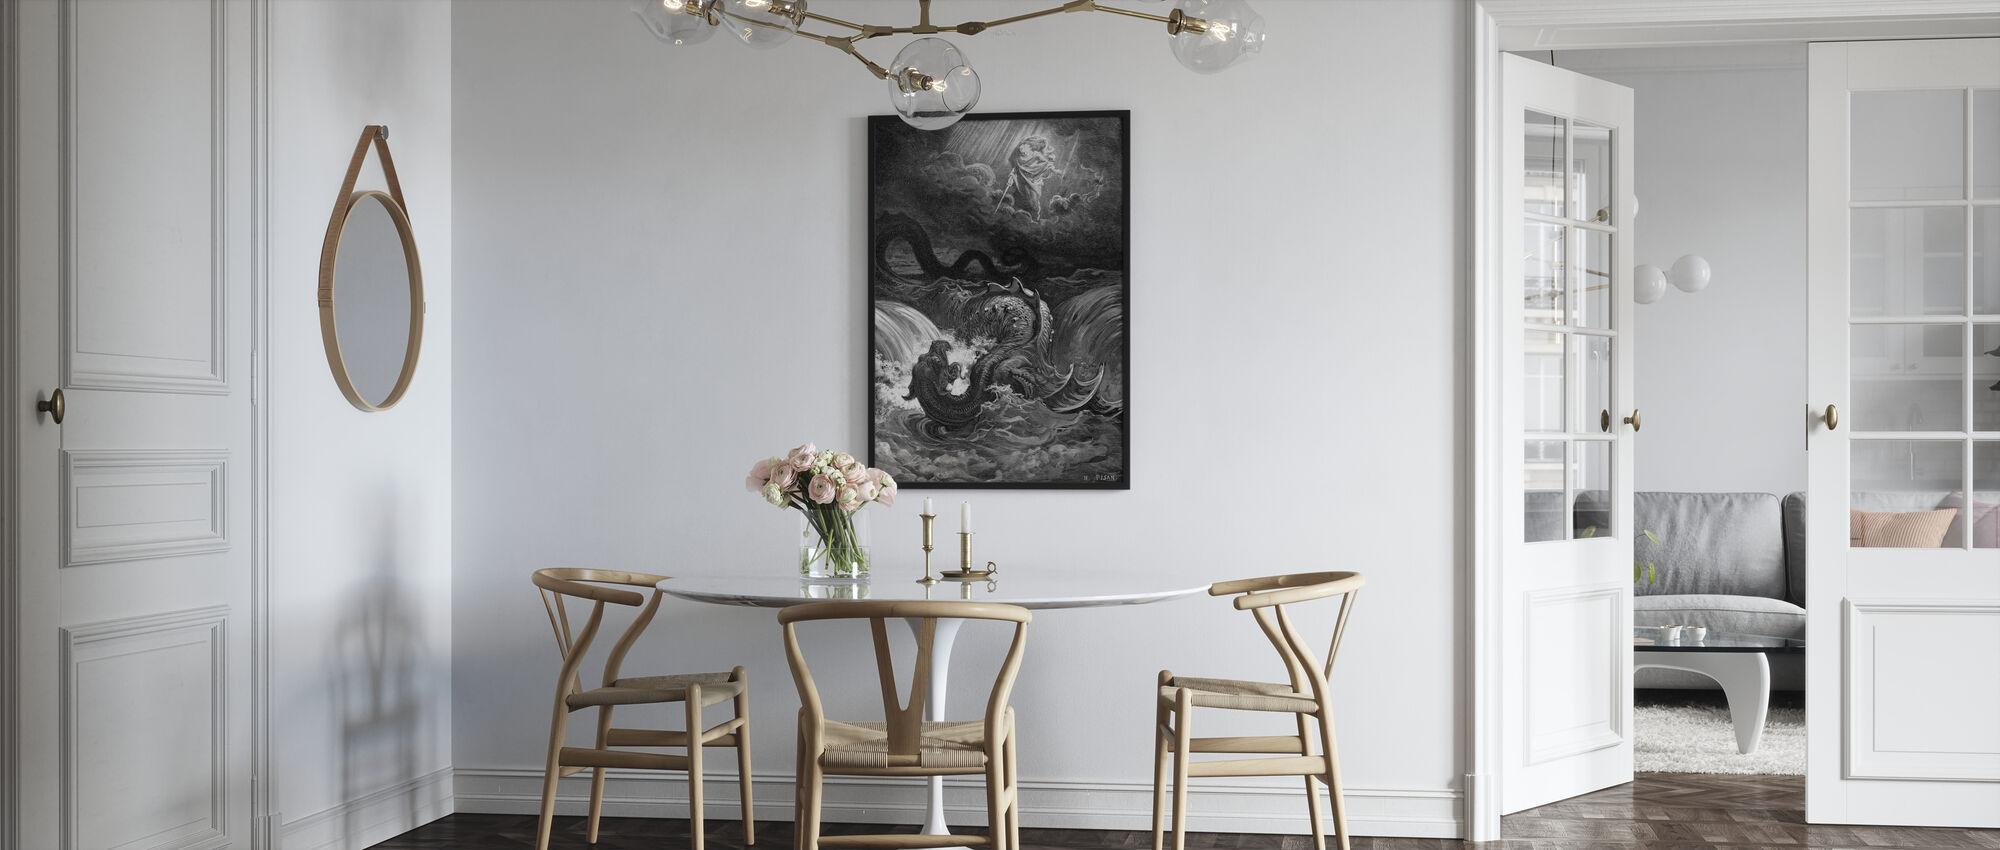 Esaias Syn - Gustave Dore - Affiche - Cuisine